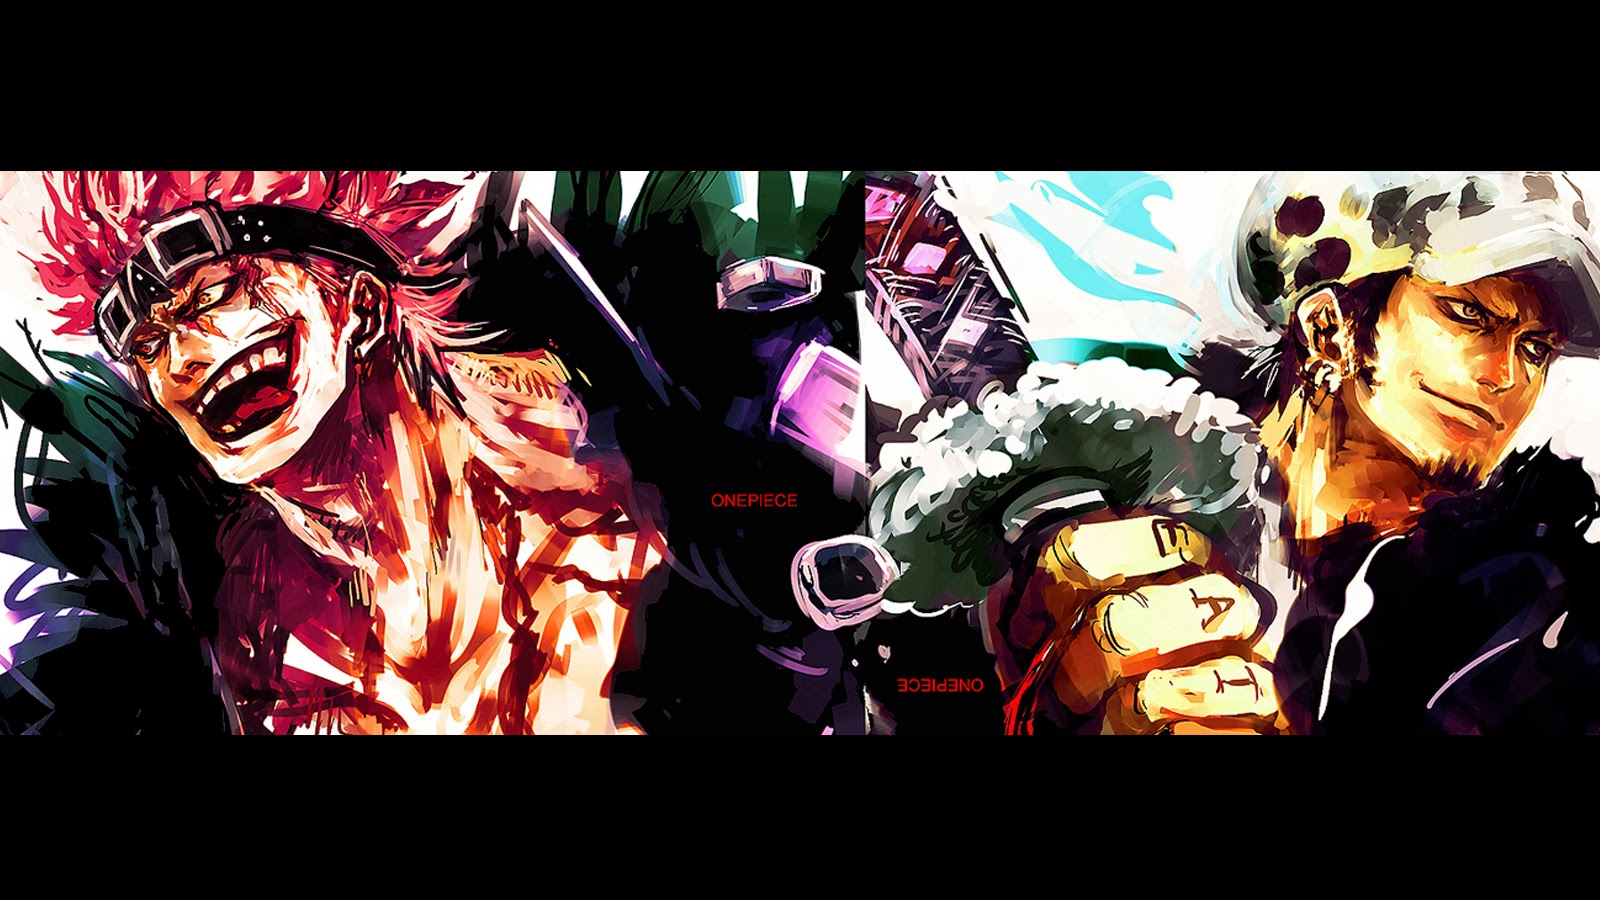 Eustass Kid Tralfagar Law Katana anime hd wallpaper y01 1600x900